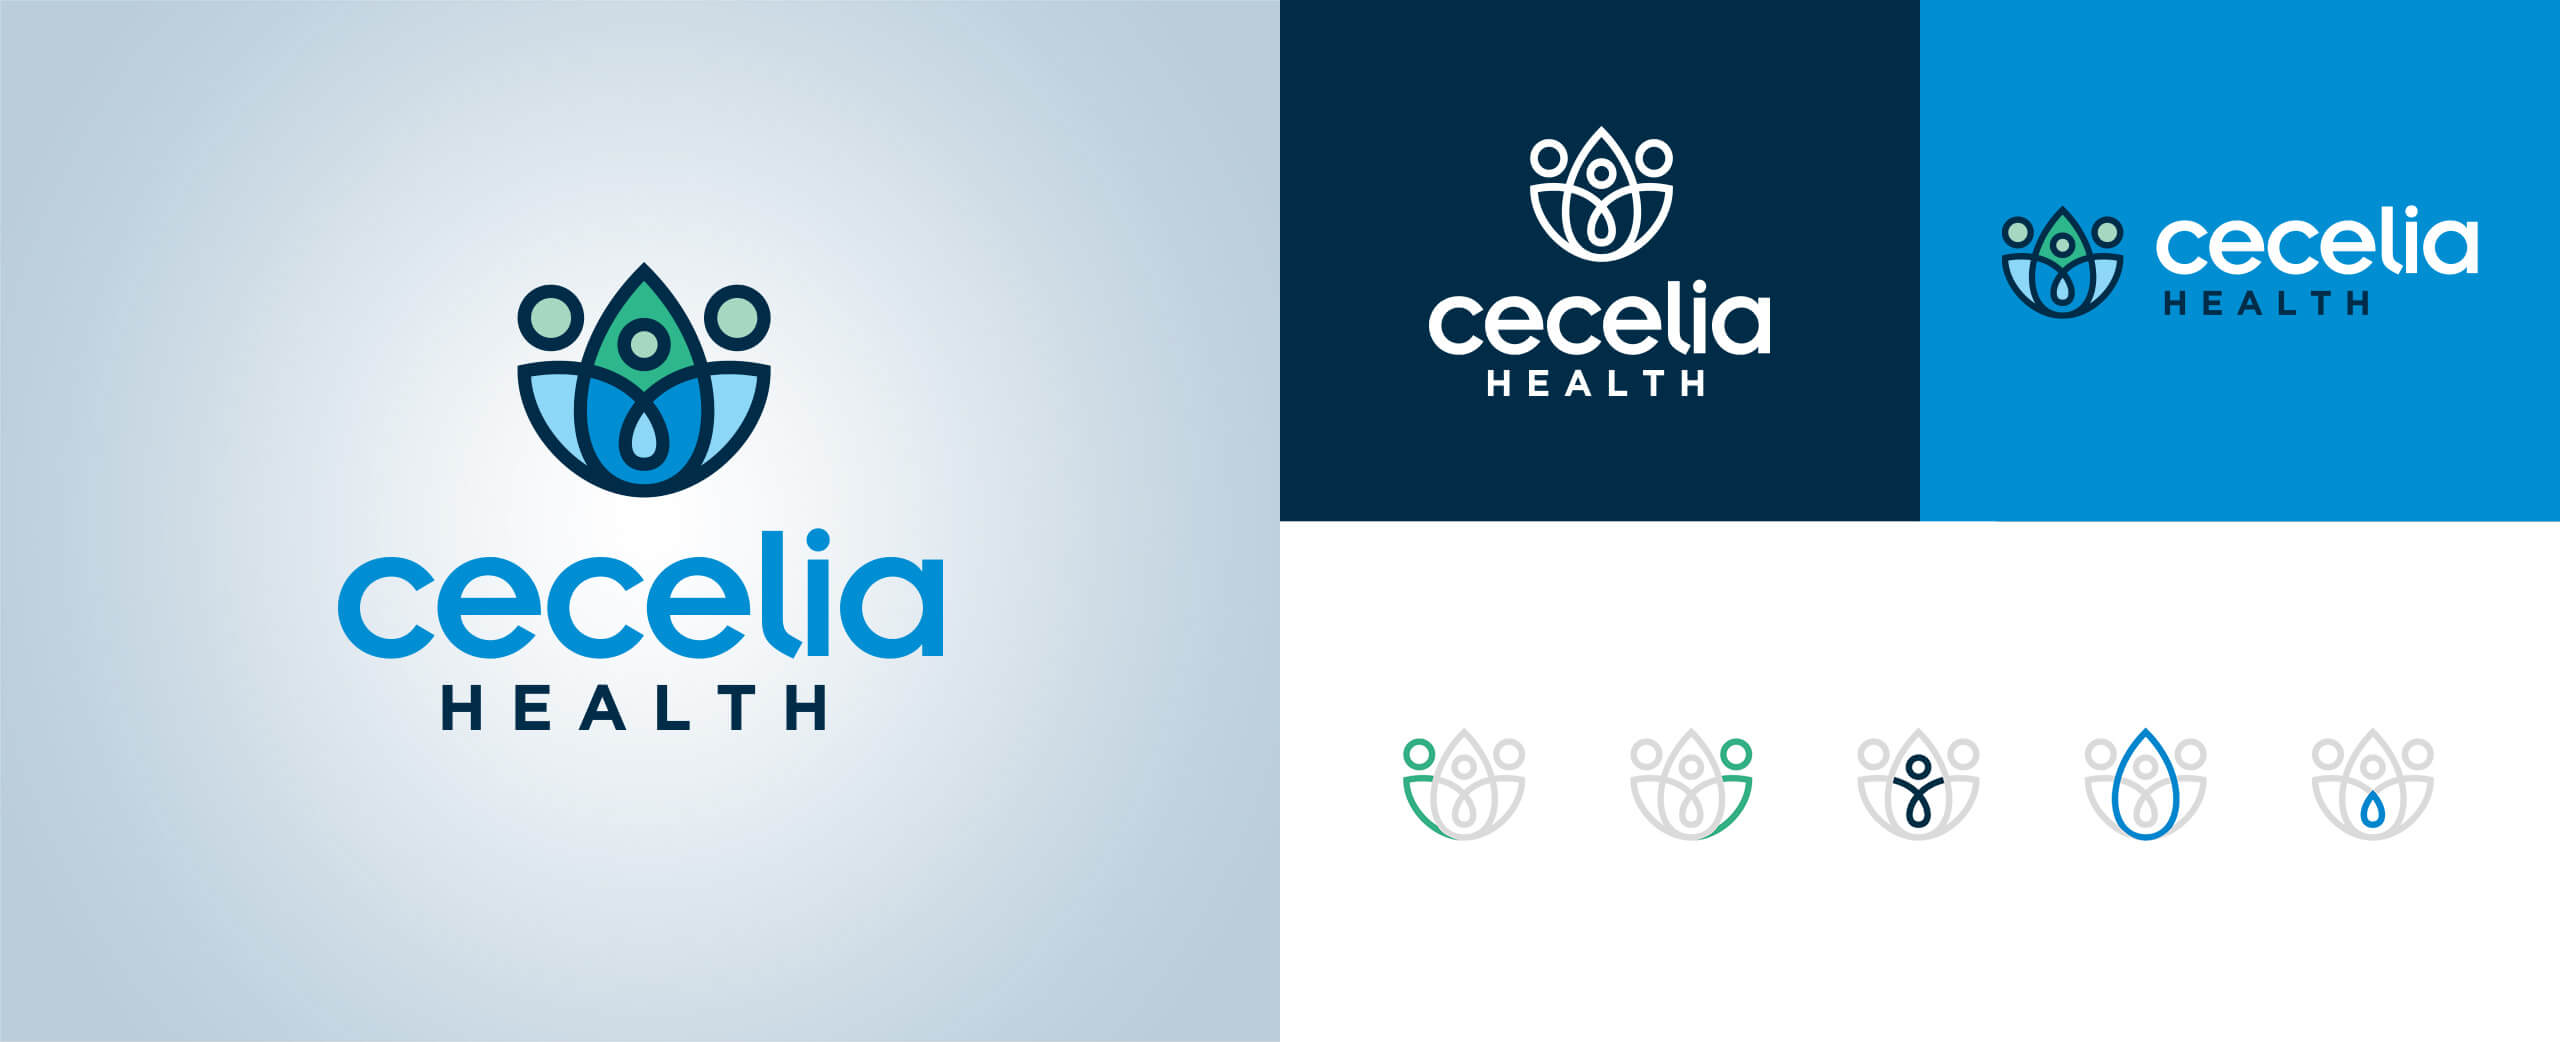 dmg-logos-cecelia-health